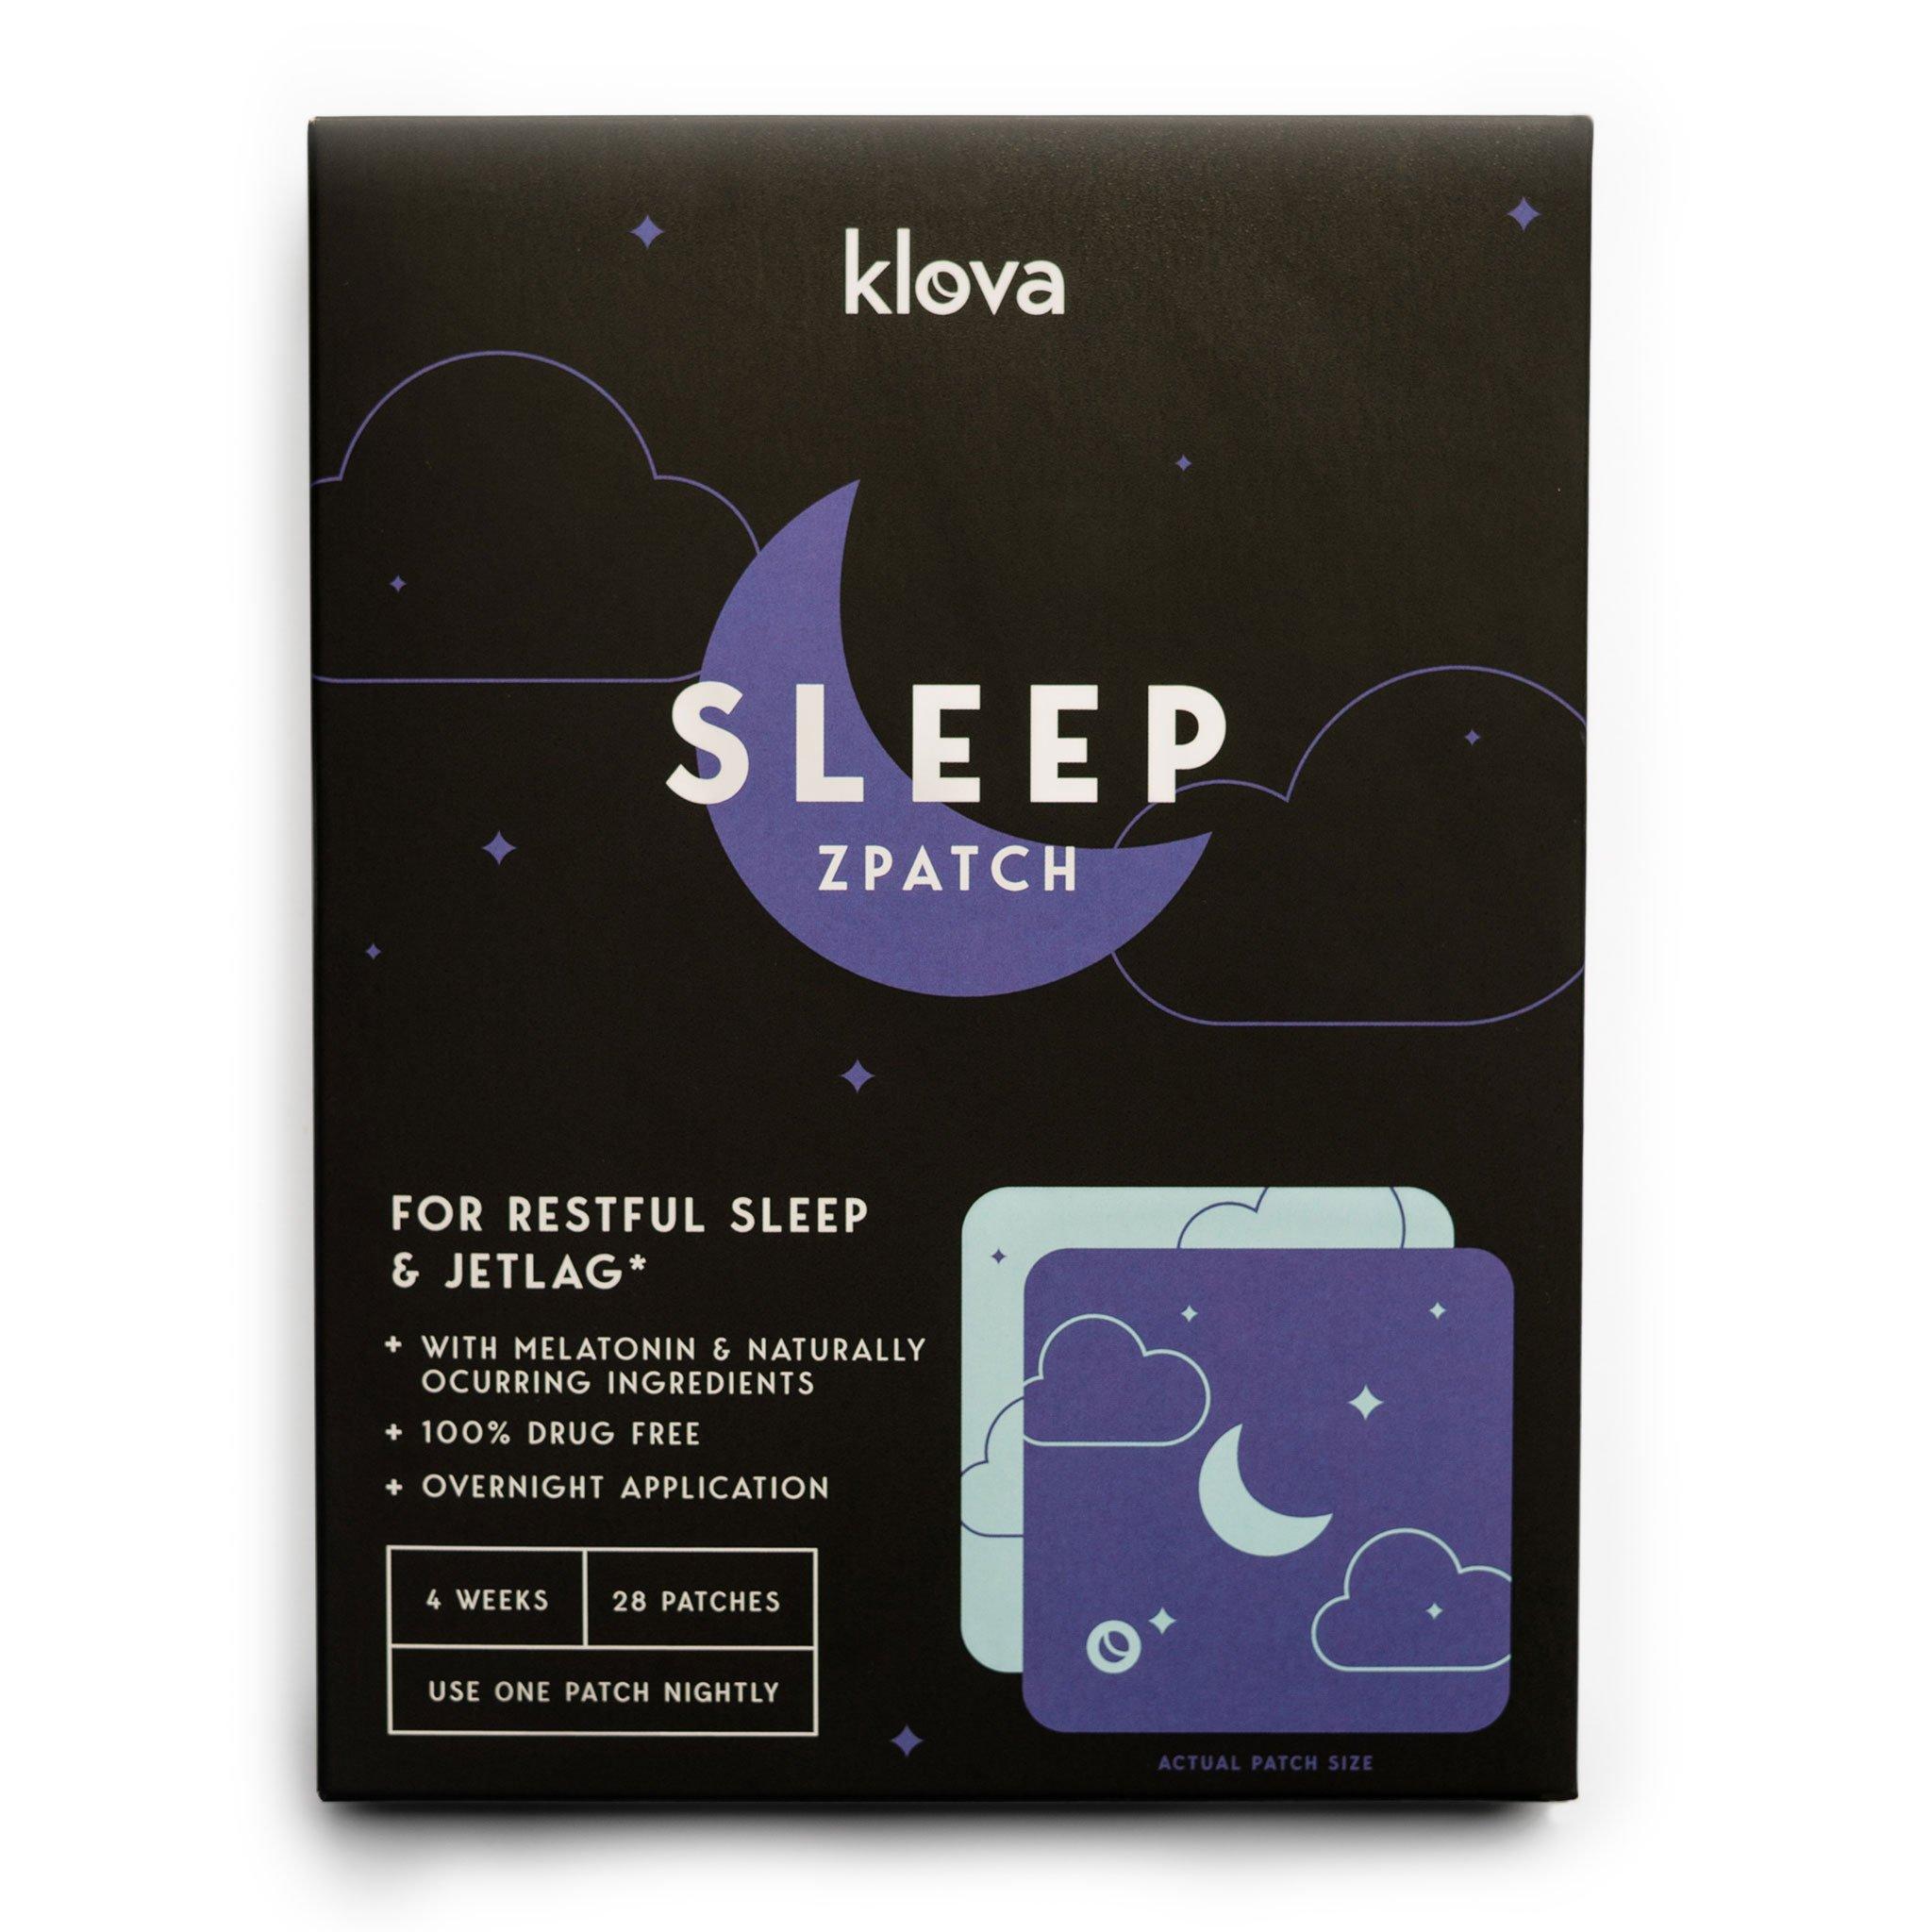 Klova Sleep Patch with Melatonin and Natural Ingredients Promotes restful Sleep and eliminates Jet lag